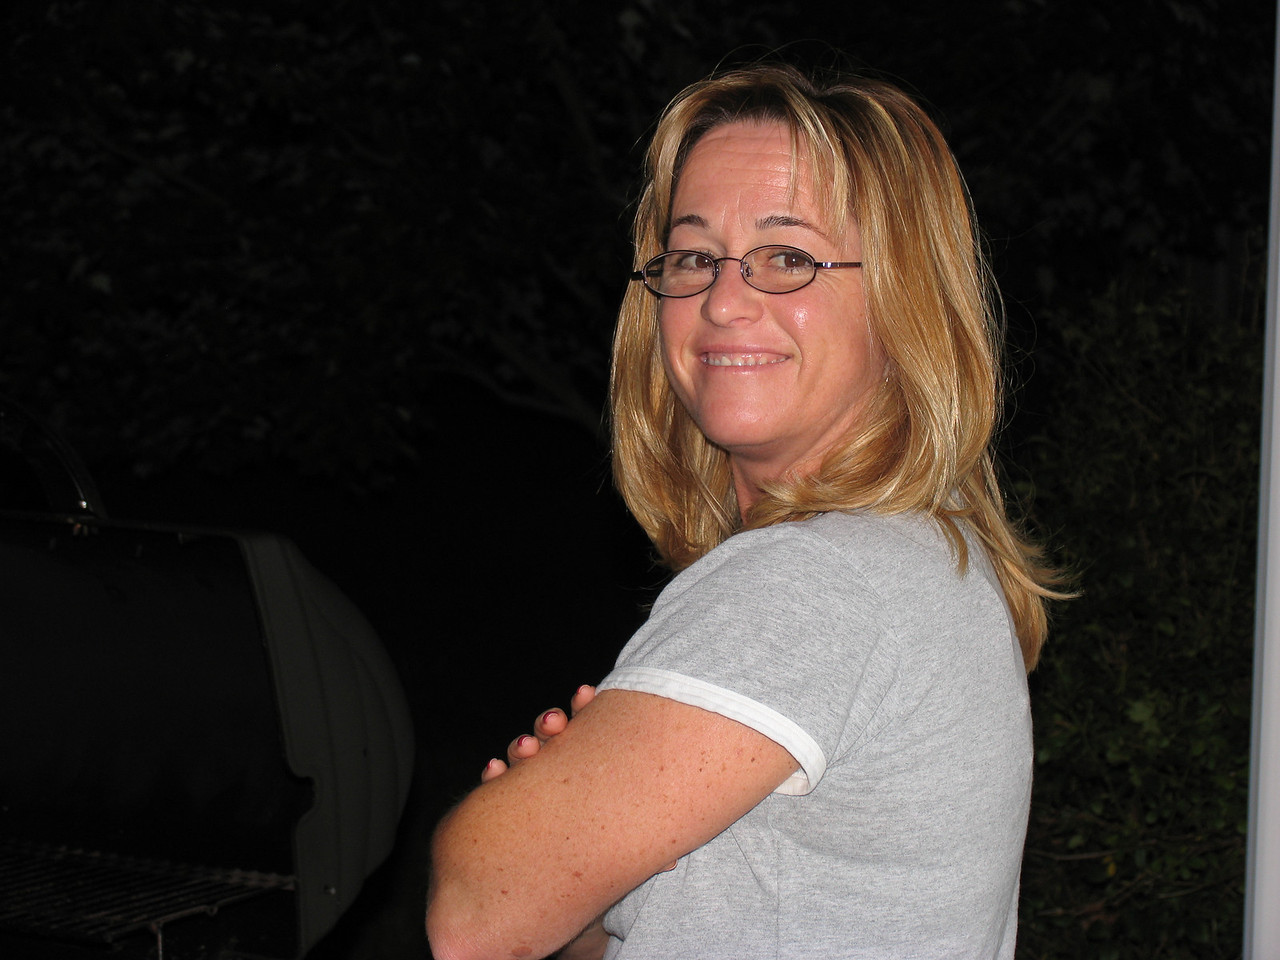 Gina Martinez - August 2005